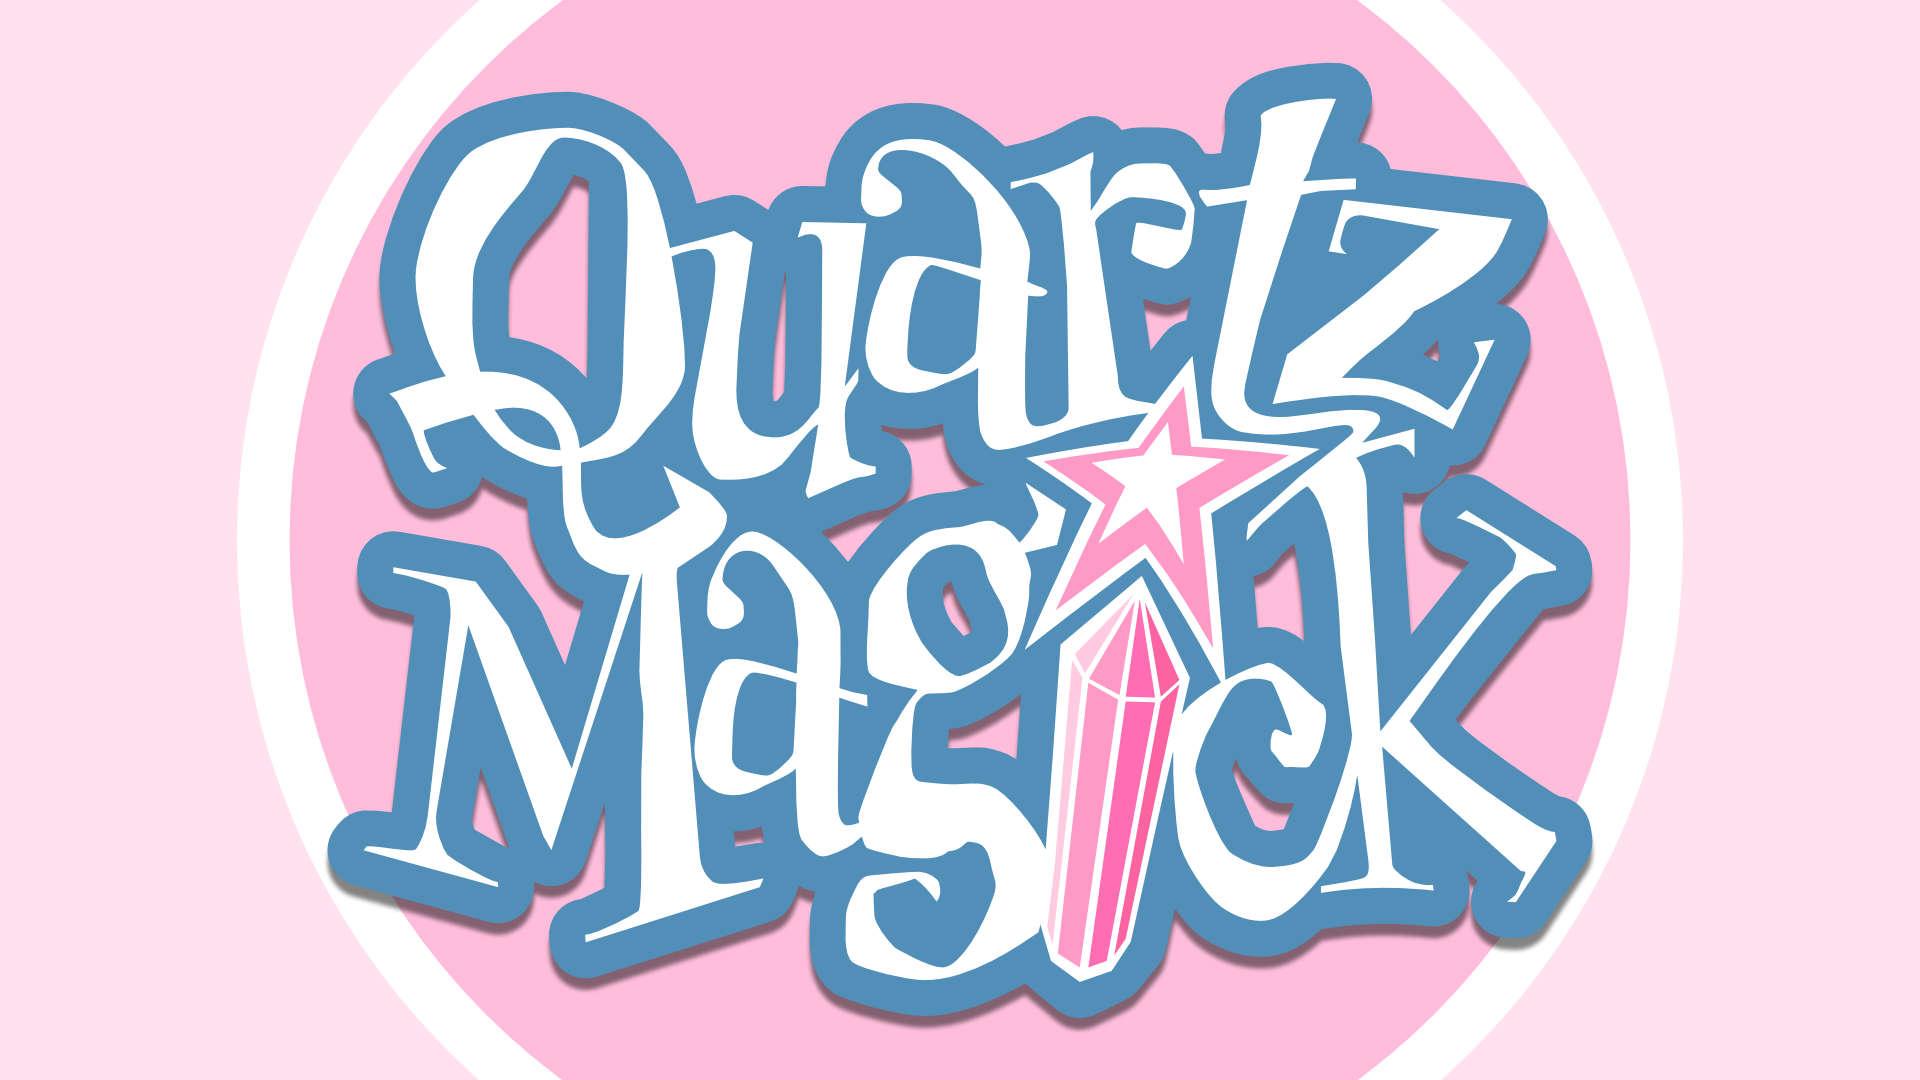 Quartz Magick on background